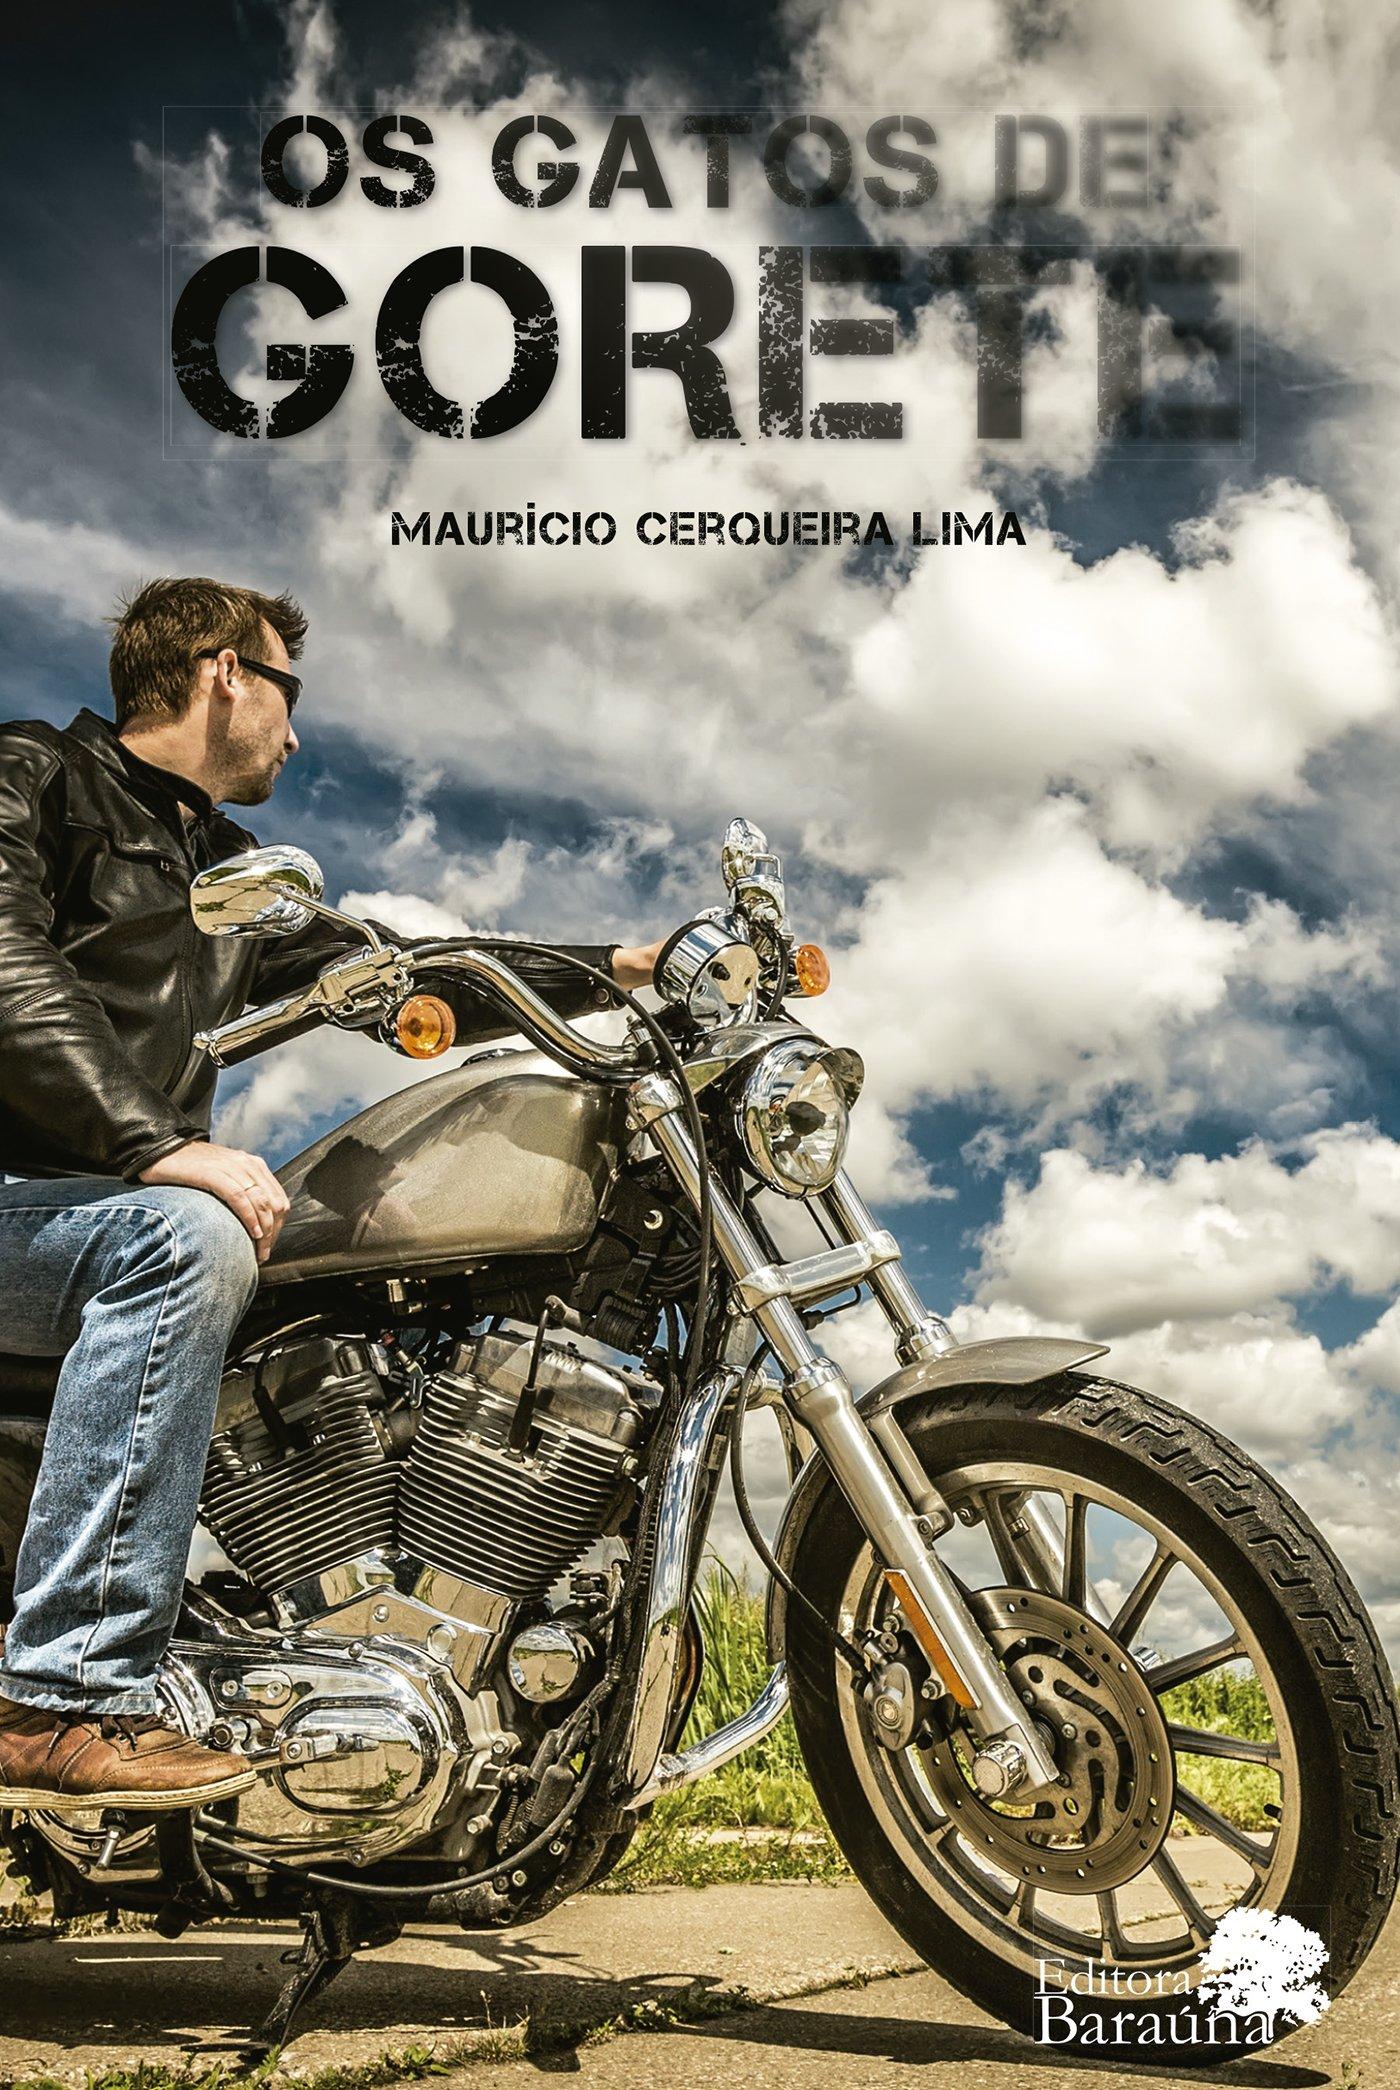 Gatos de Gorete, Os (Portuguese Brazilian) Paperback – 2015